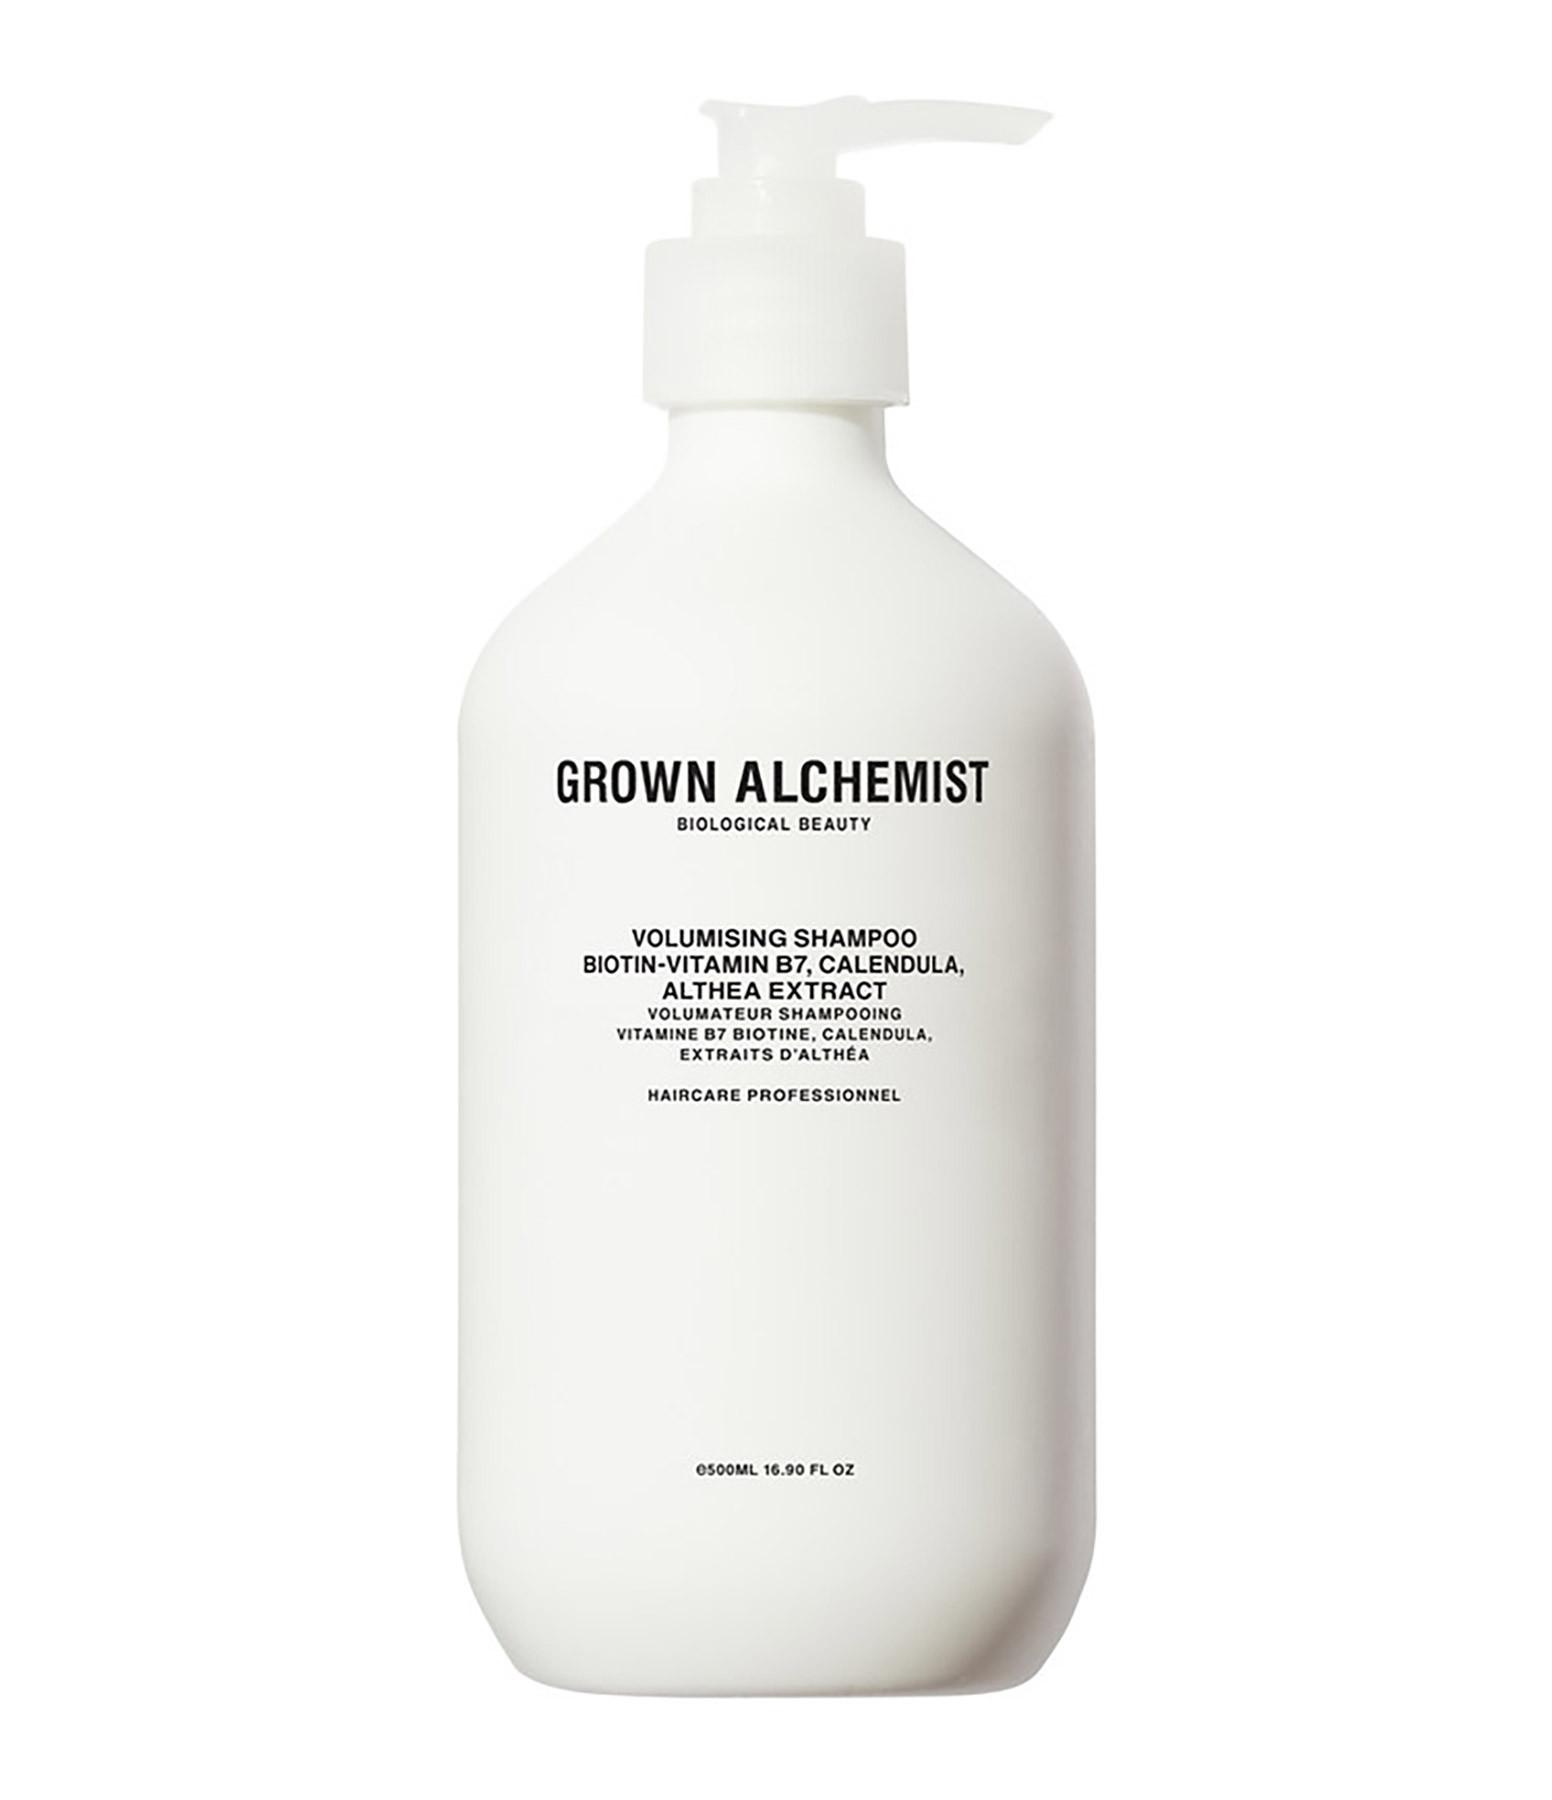 GROWN ALCHEMIST - Shampoing Volumisant 500 ml